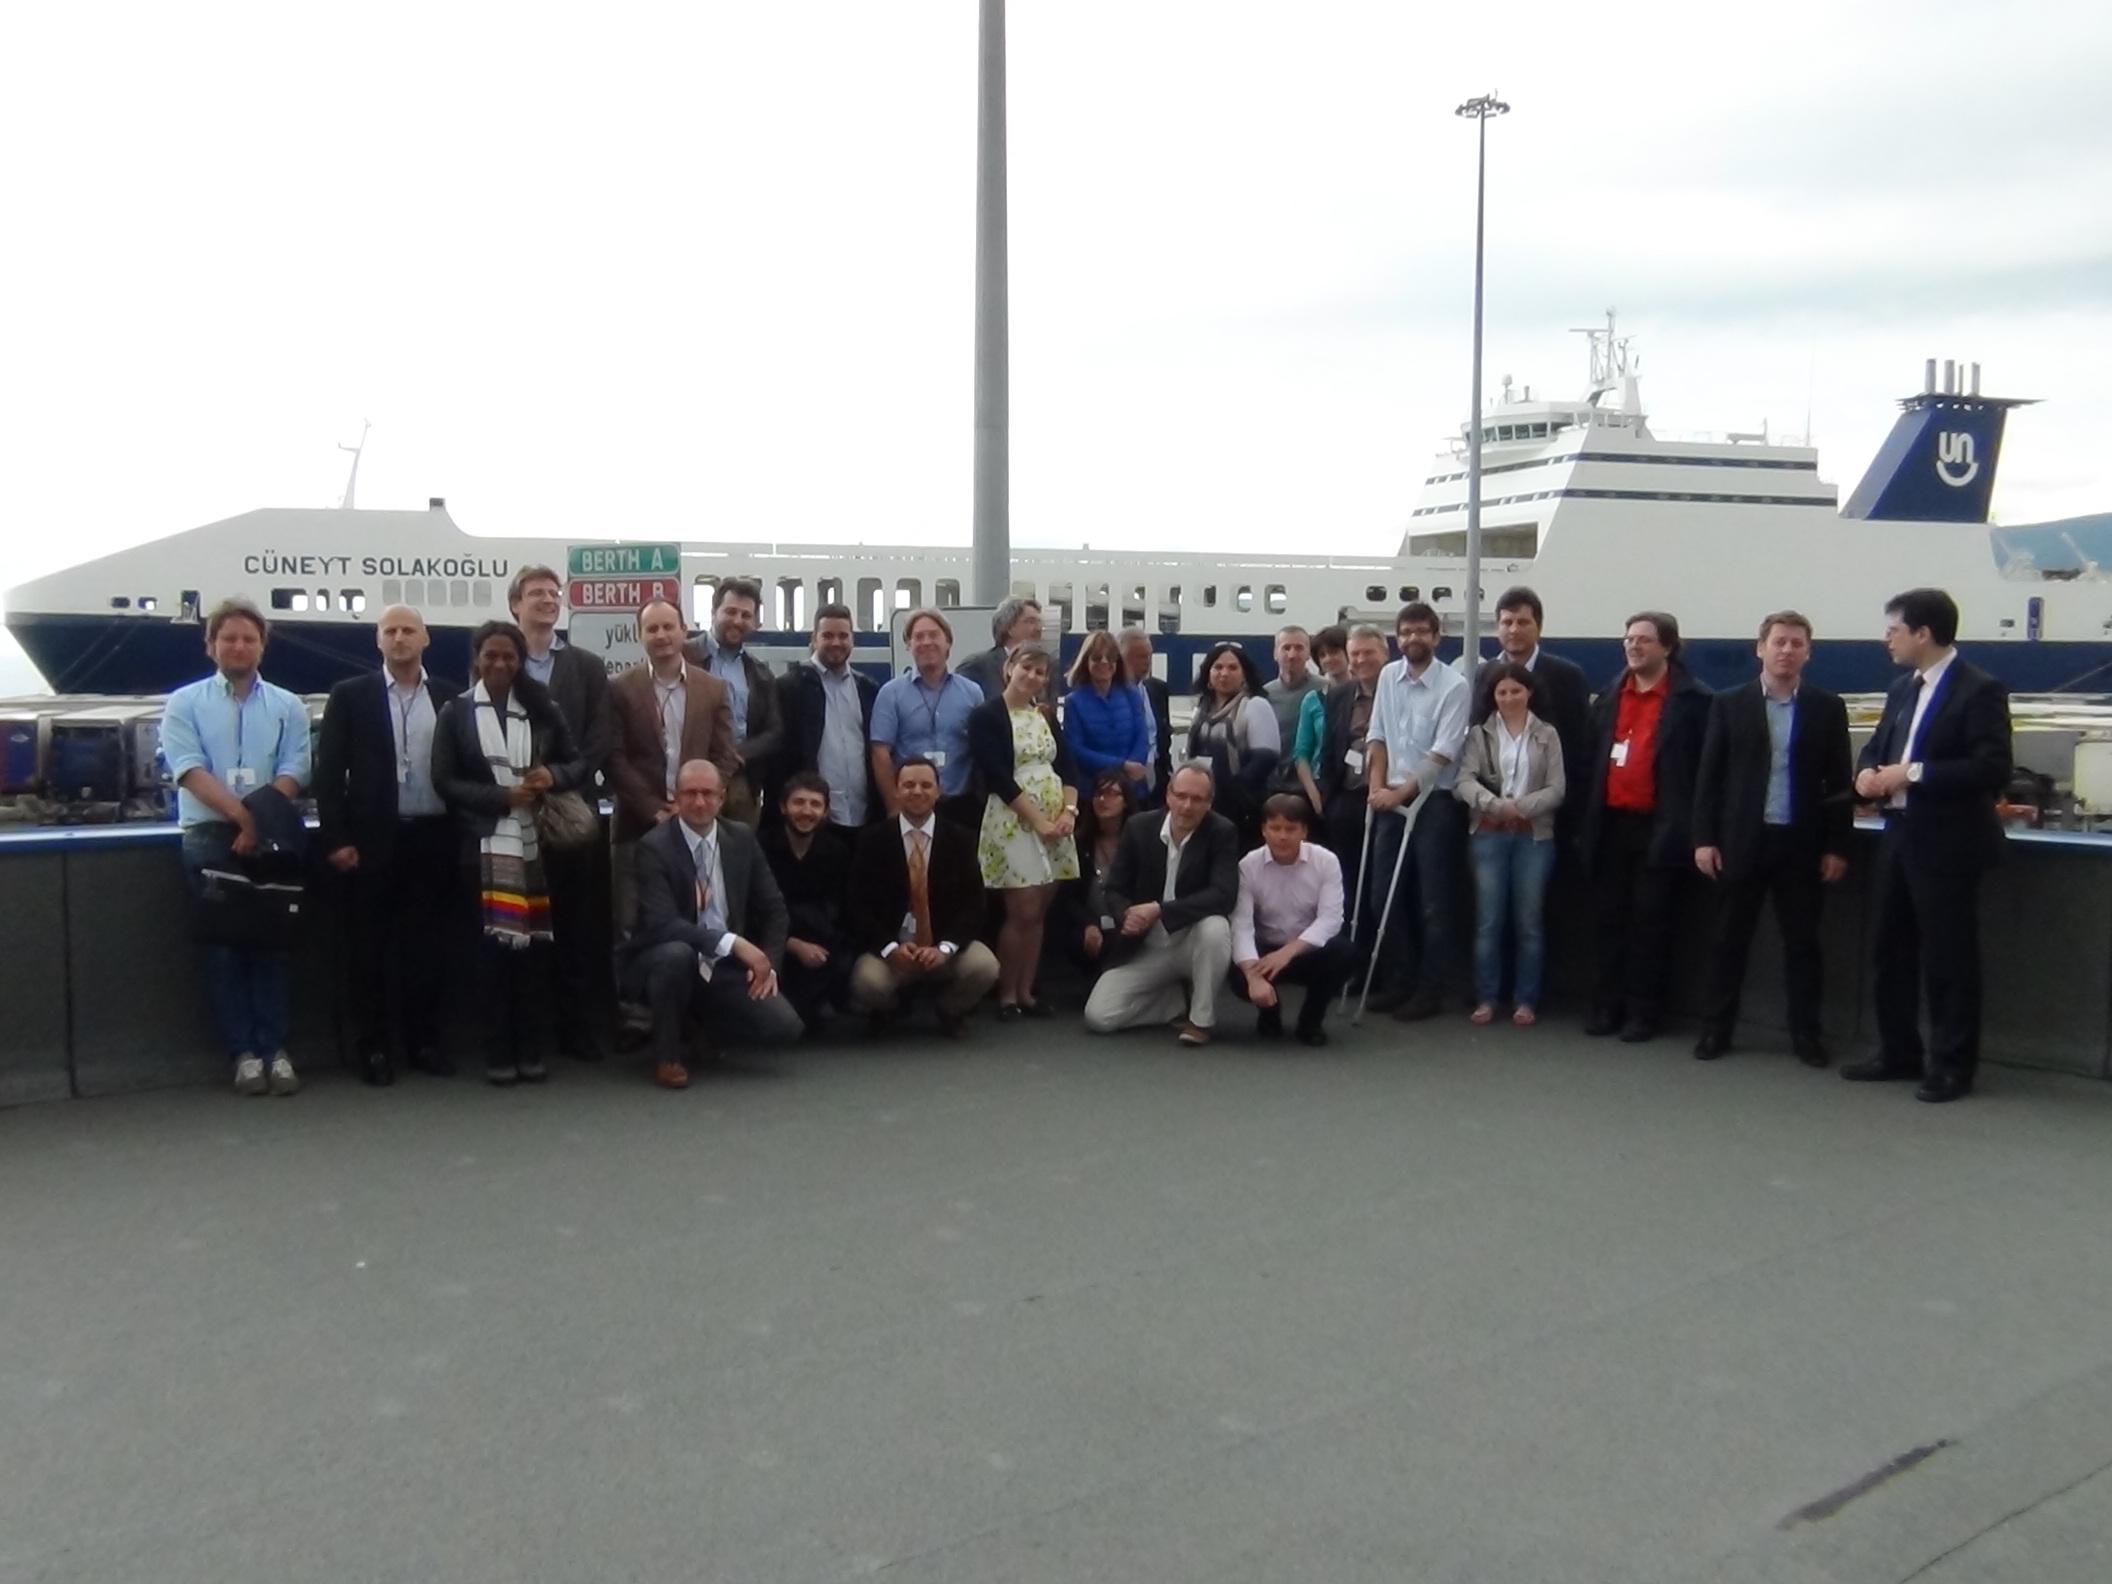 Visiting the Italian pilot site in Trieste